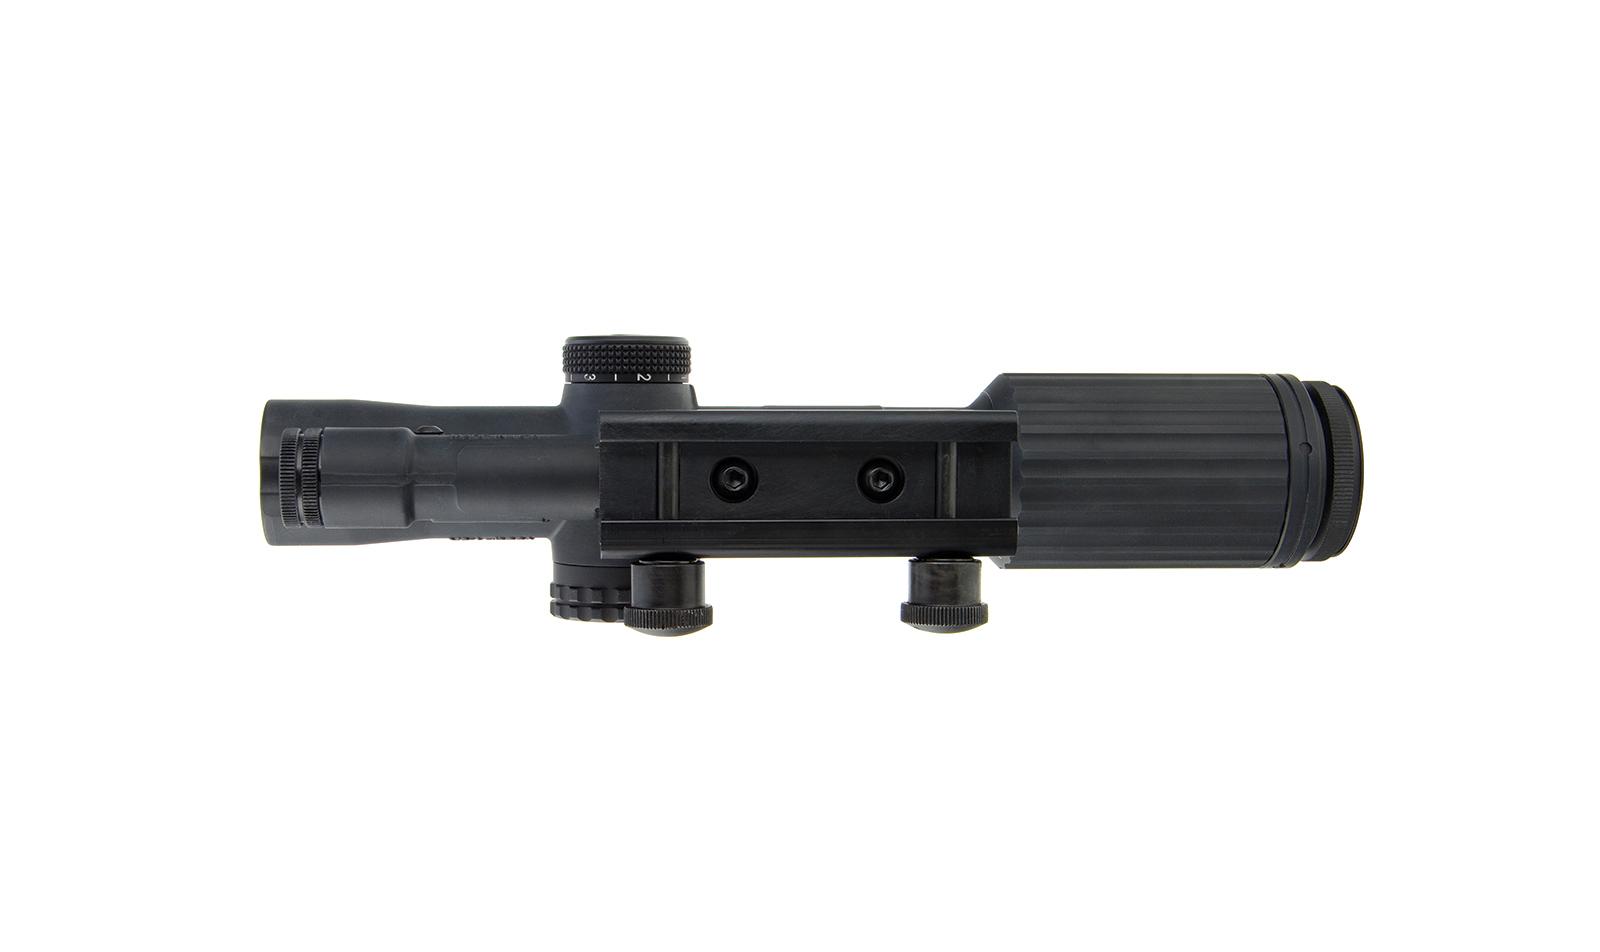 VC16-C-1600005 angle 10